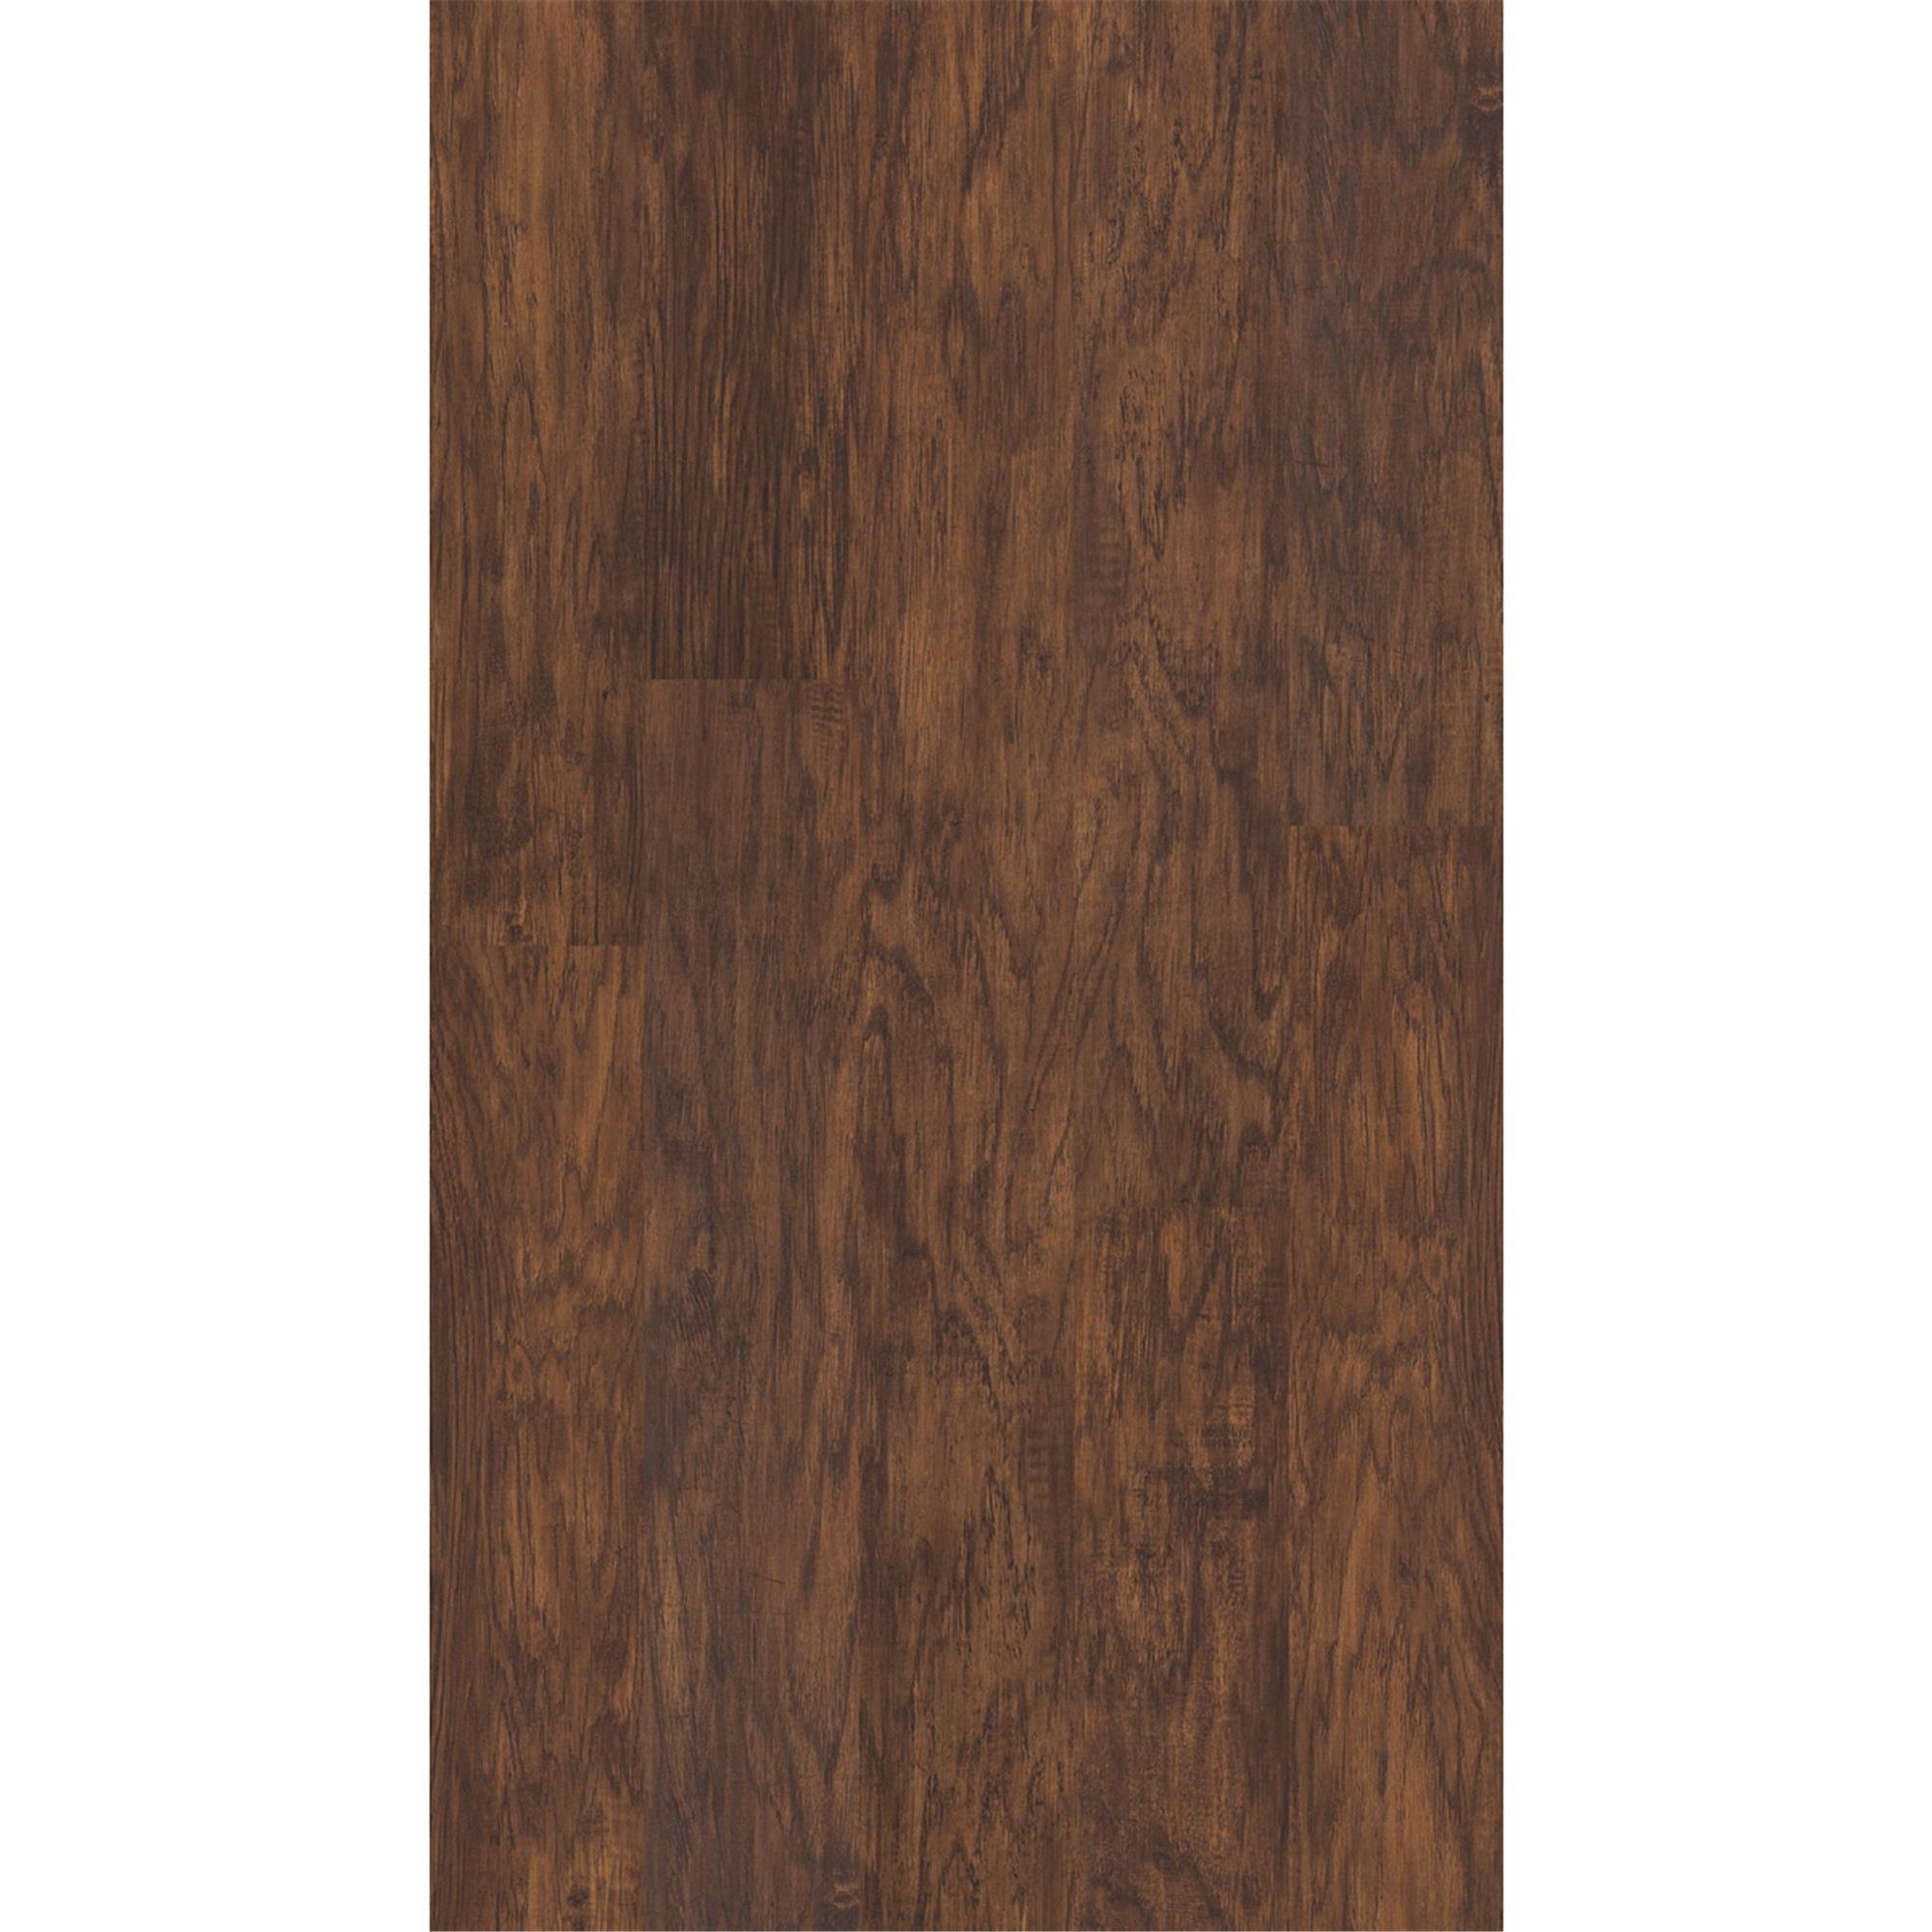 SHAW Aviator Better Luxury Virgin Vinyl Floor Plank